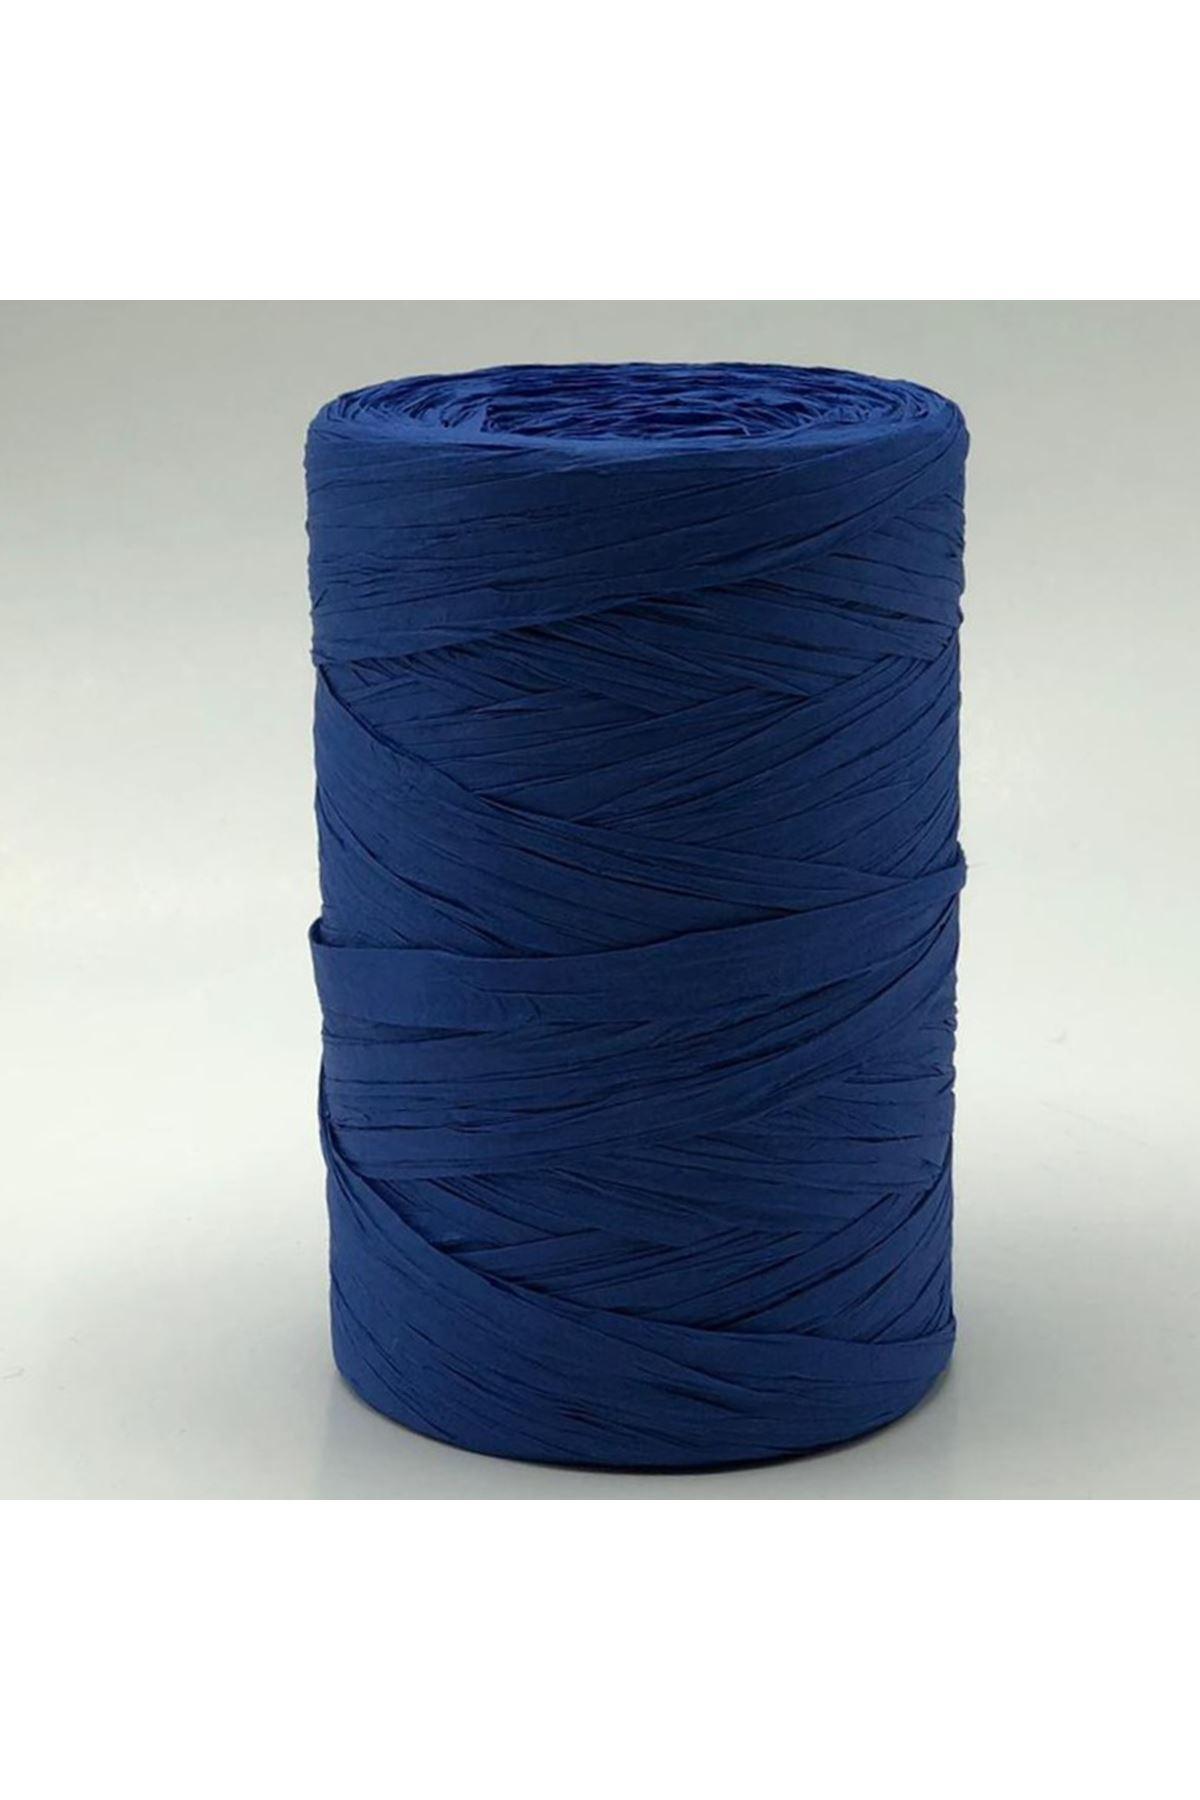 Rafya İp 004 Saks Mavisi